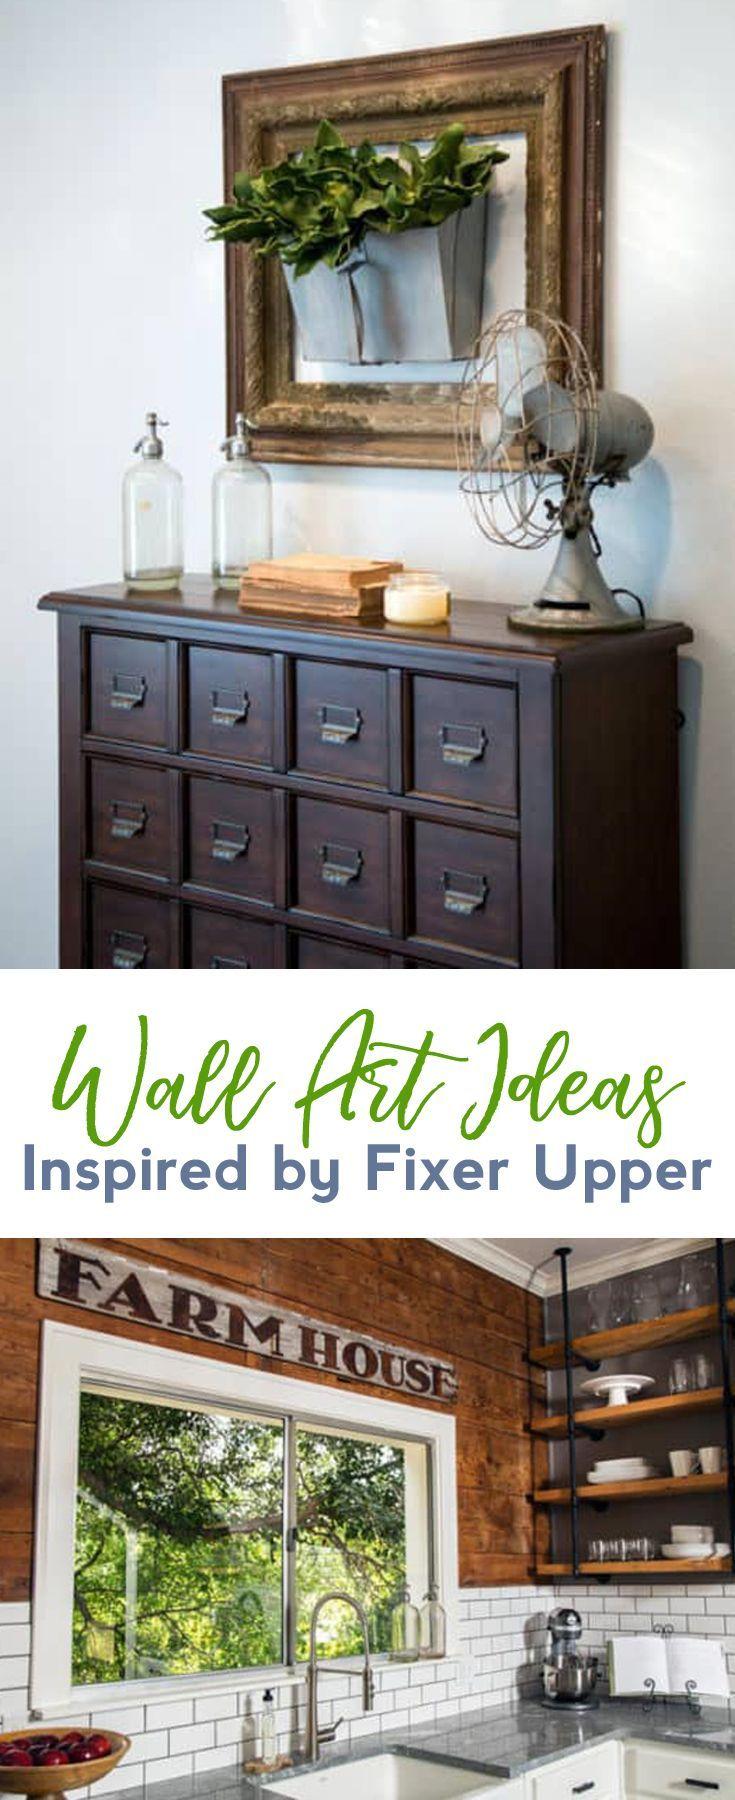 Farmhouse decor easy wall art ideas inspired by fixer upper